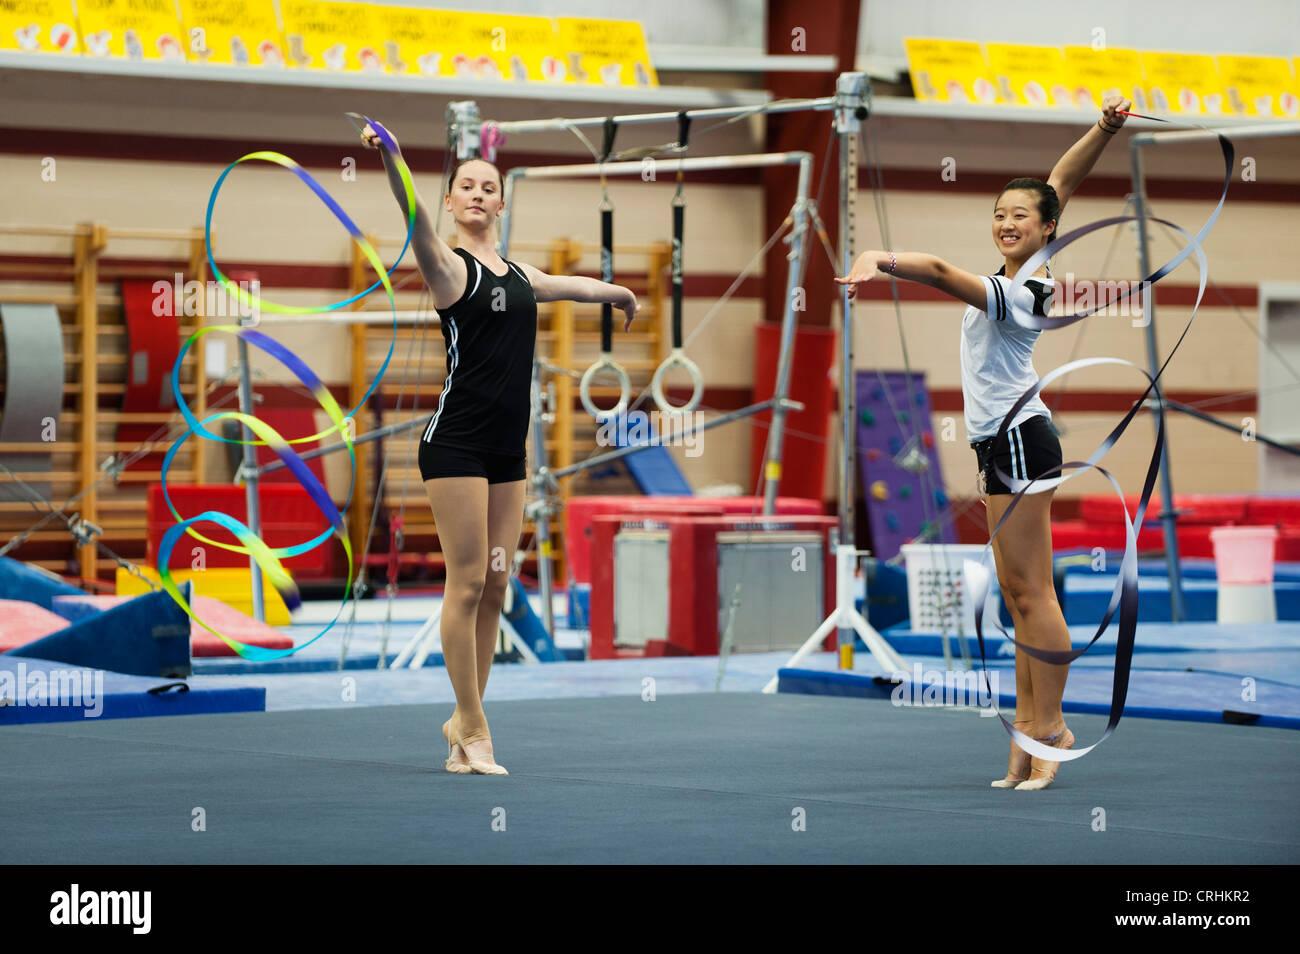 gymnastics practice stock photos amp gymnastics practice